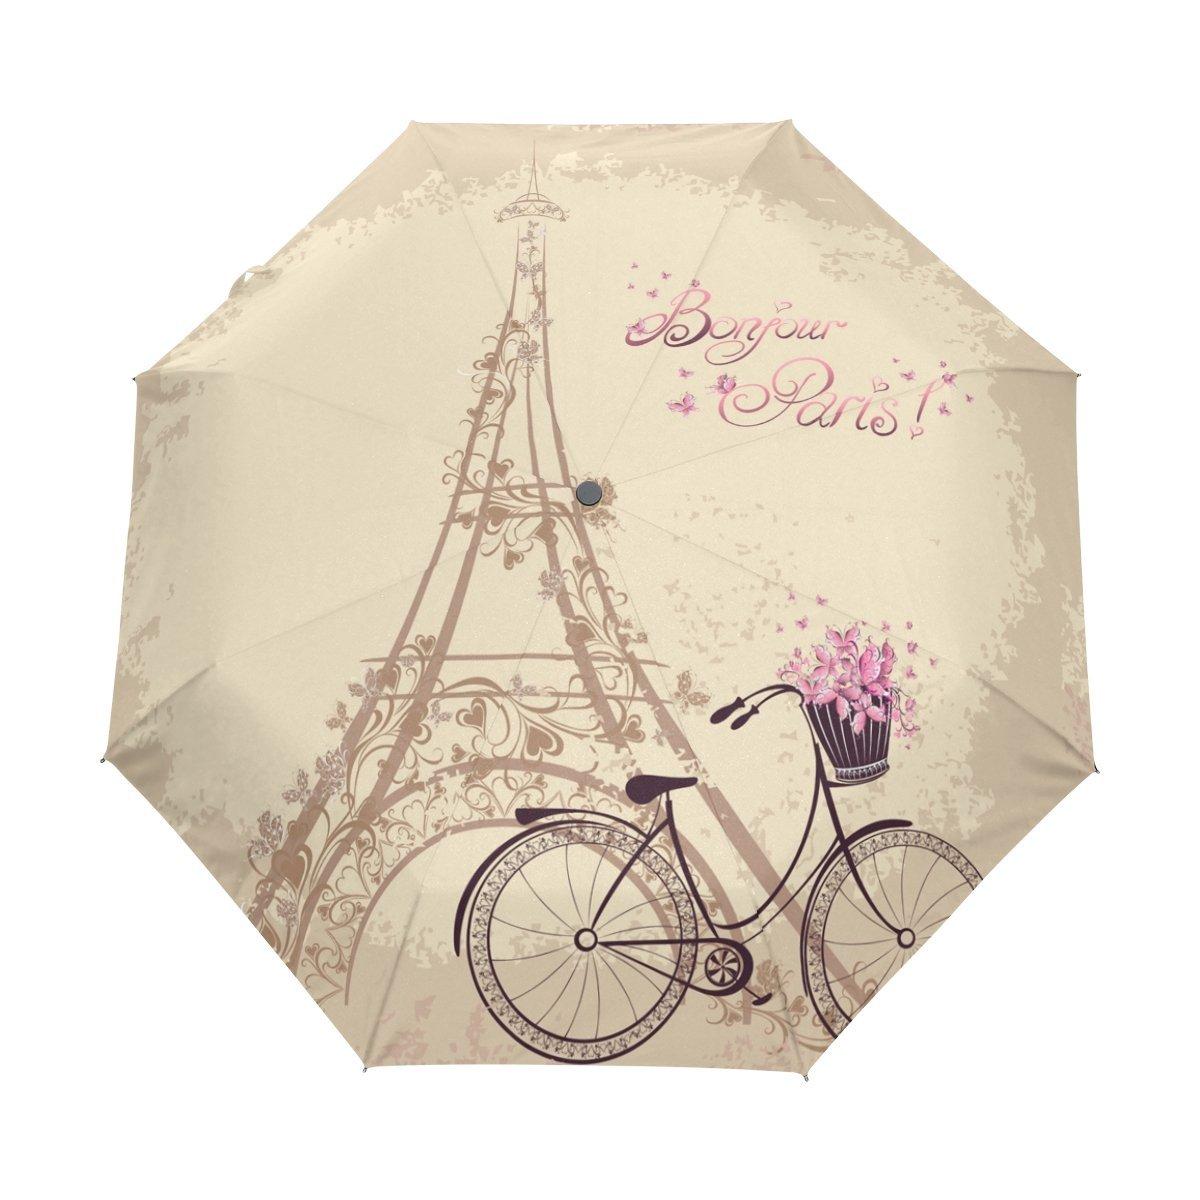 Naanle Romantic Paris Eiffel Tower Bicycle Auto Open Close Foldable Travel Umbrella